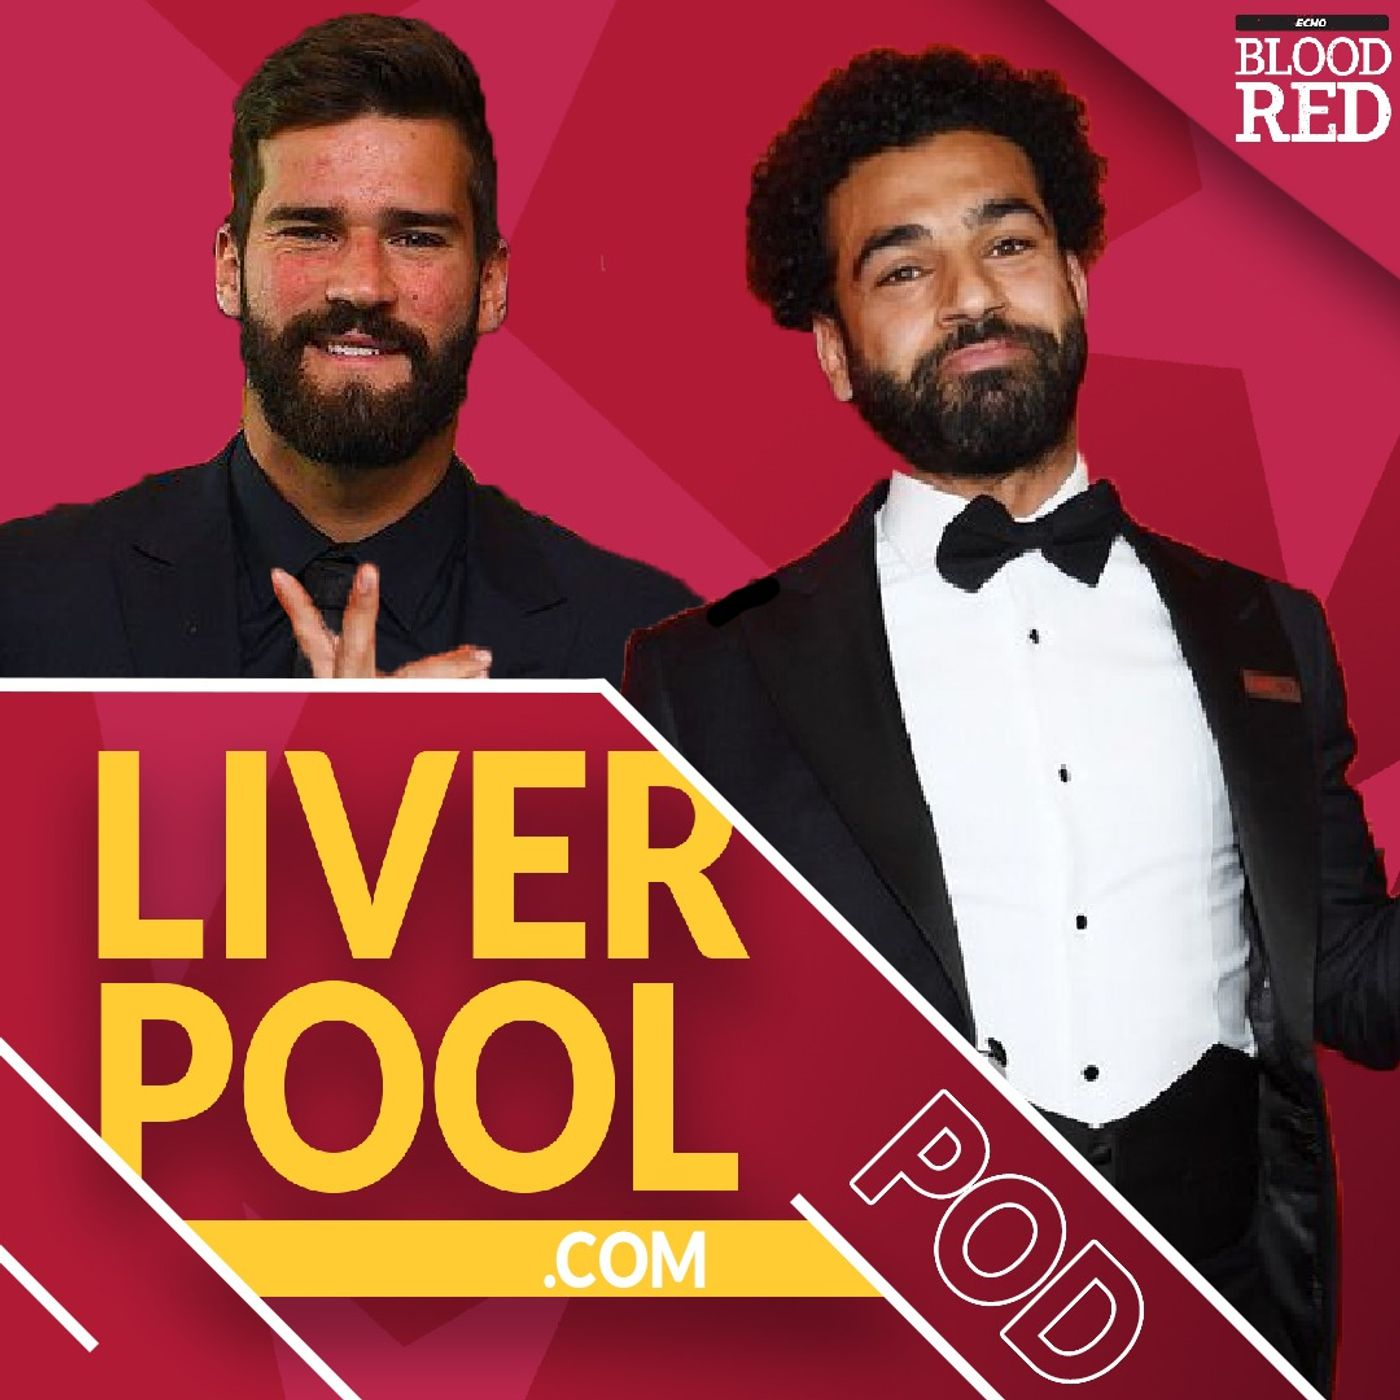 Liverpool.com podcast: End of season awards special   Mo Salah, Alisson & Jurgen Klopp's forgotten masterpiece